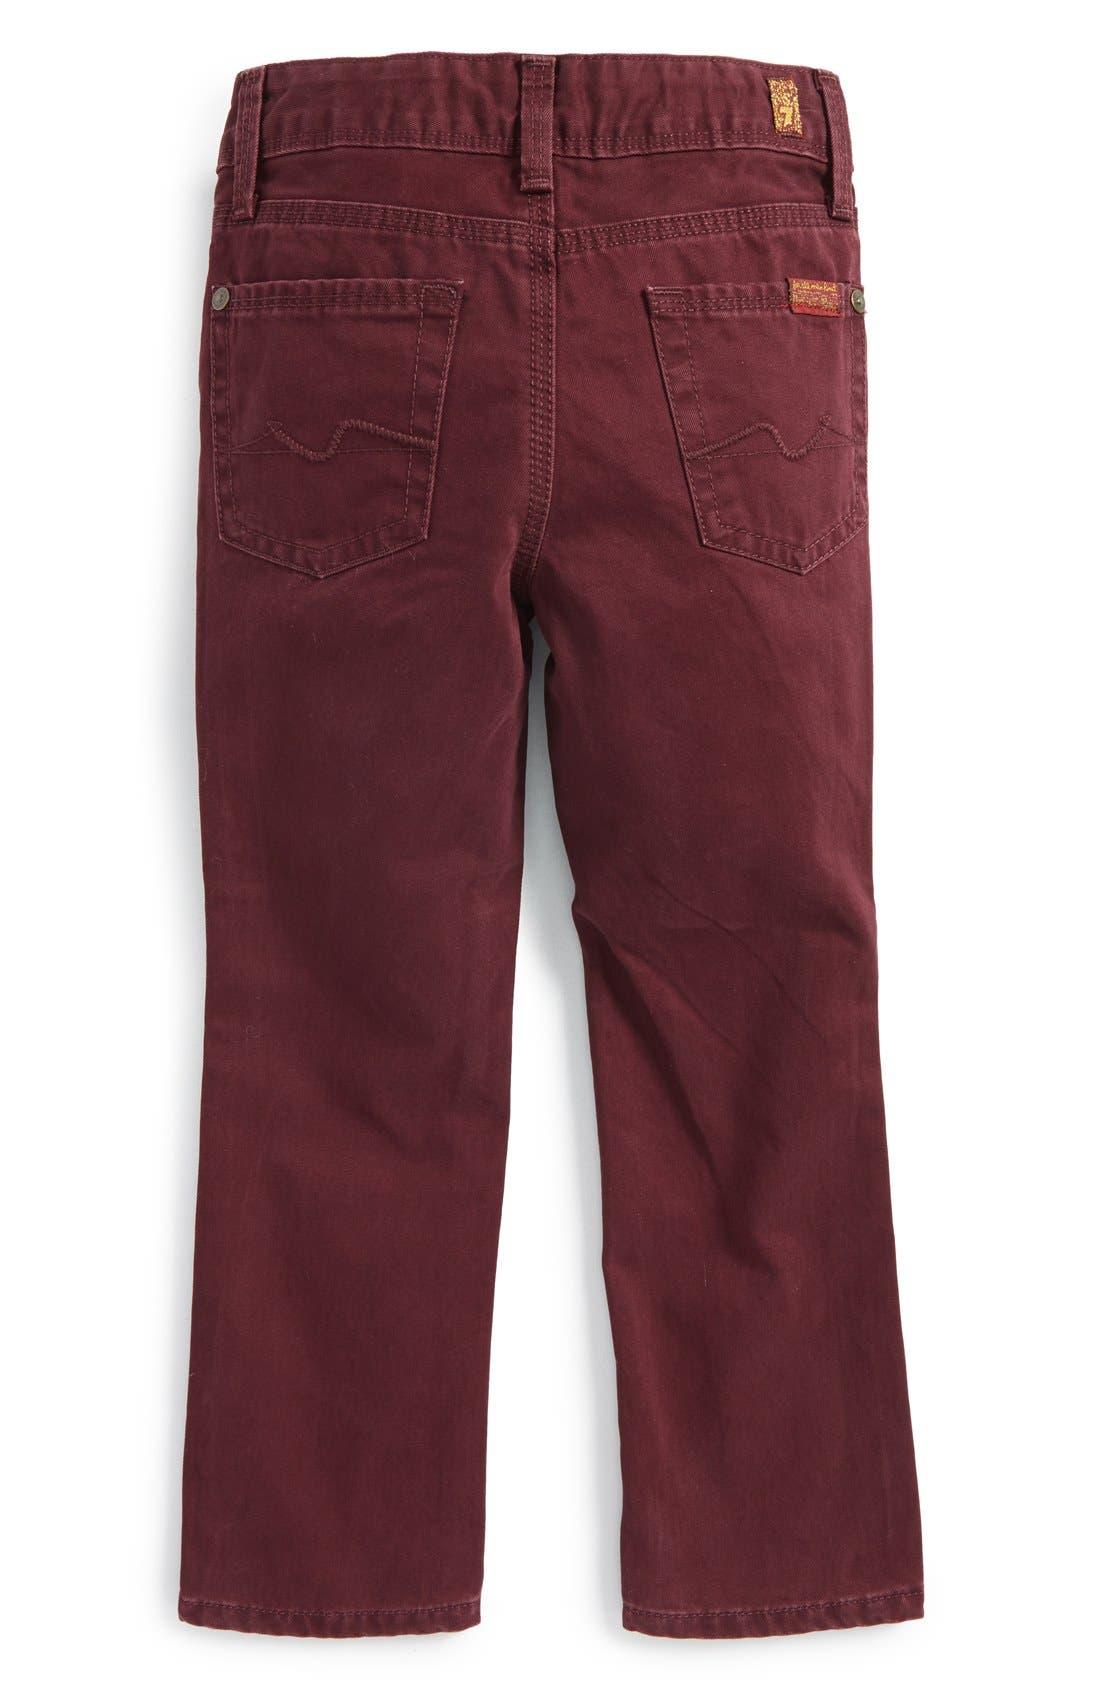 Alternate Image 2  - 7 For All Mankind® 'Slimmy' Slim Fit Jeans (Toddler Boys & Little Boys) (Online Only)